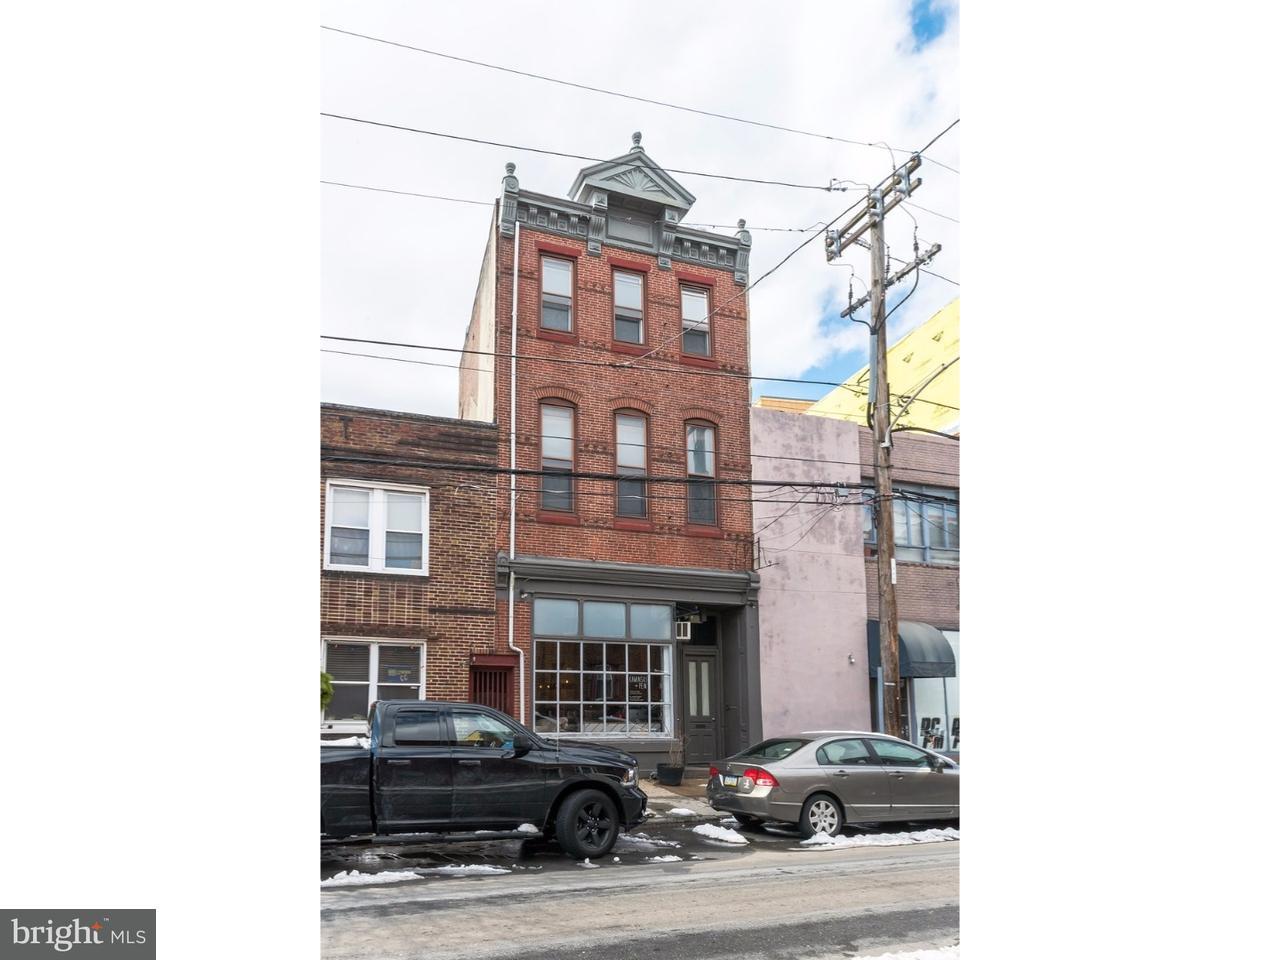 716 Philadelphia St Covington, KY 41011